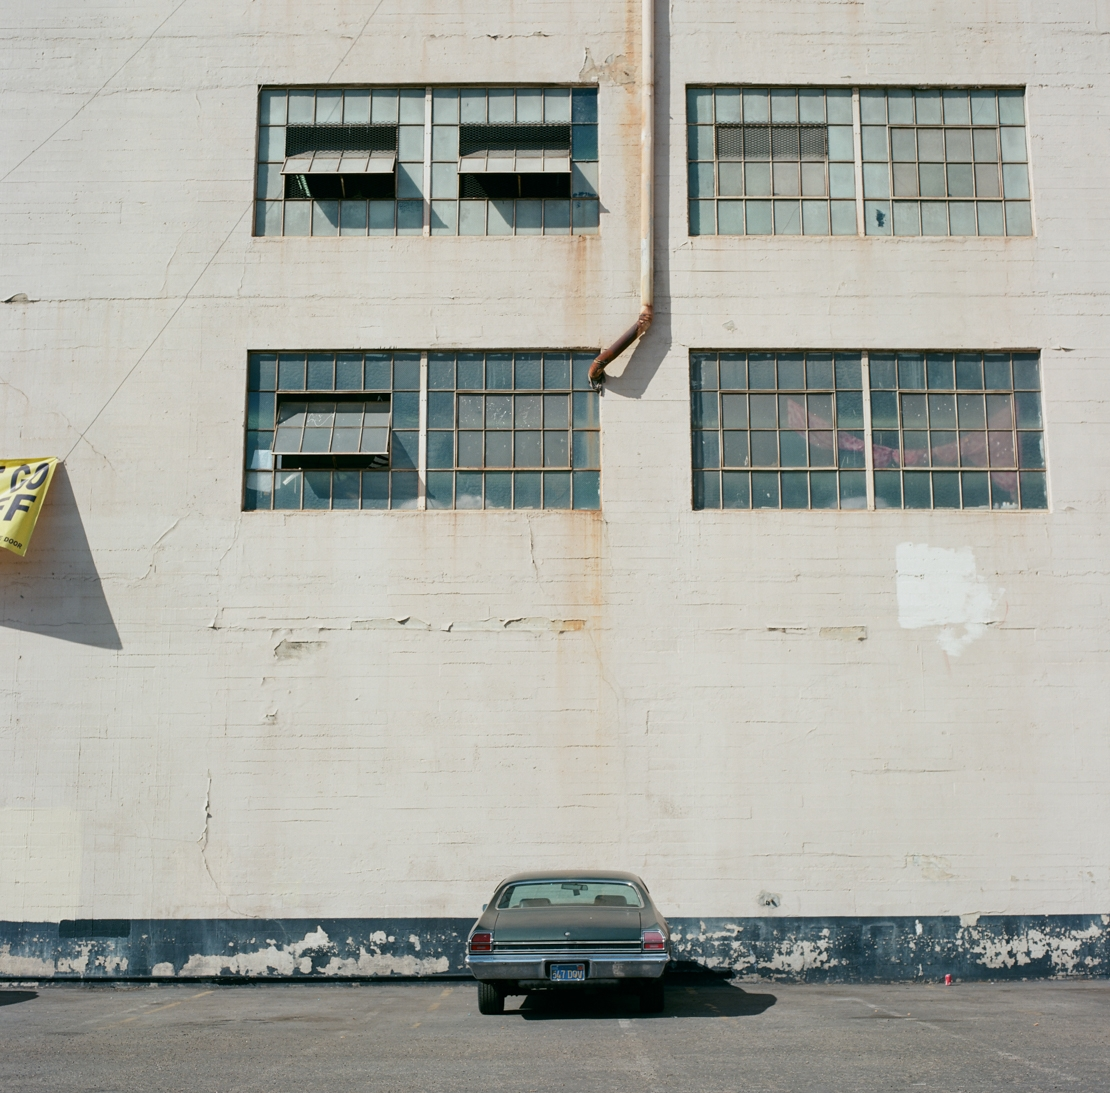 #allcitiesarebeautiful 038 Tim Ronca — Los Angeles